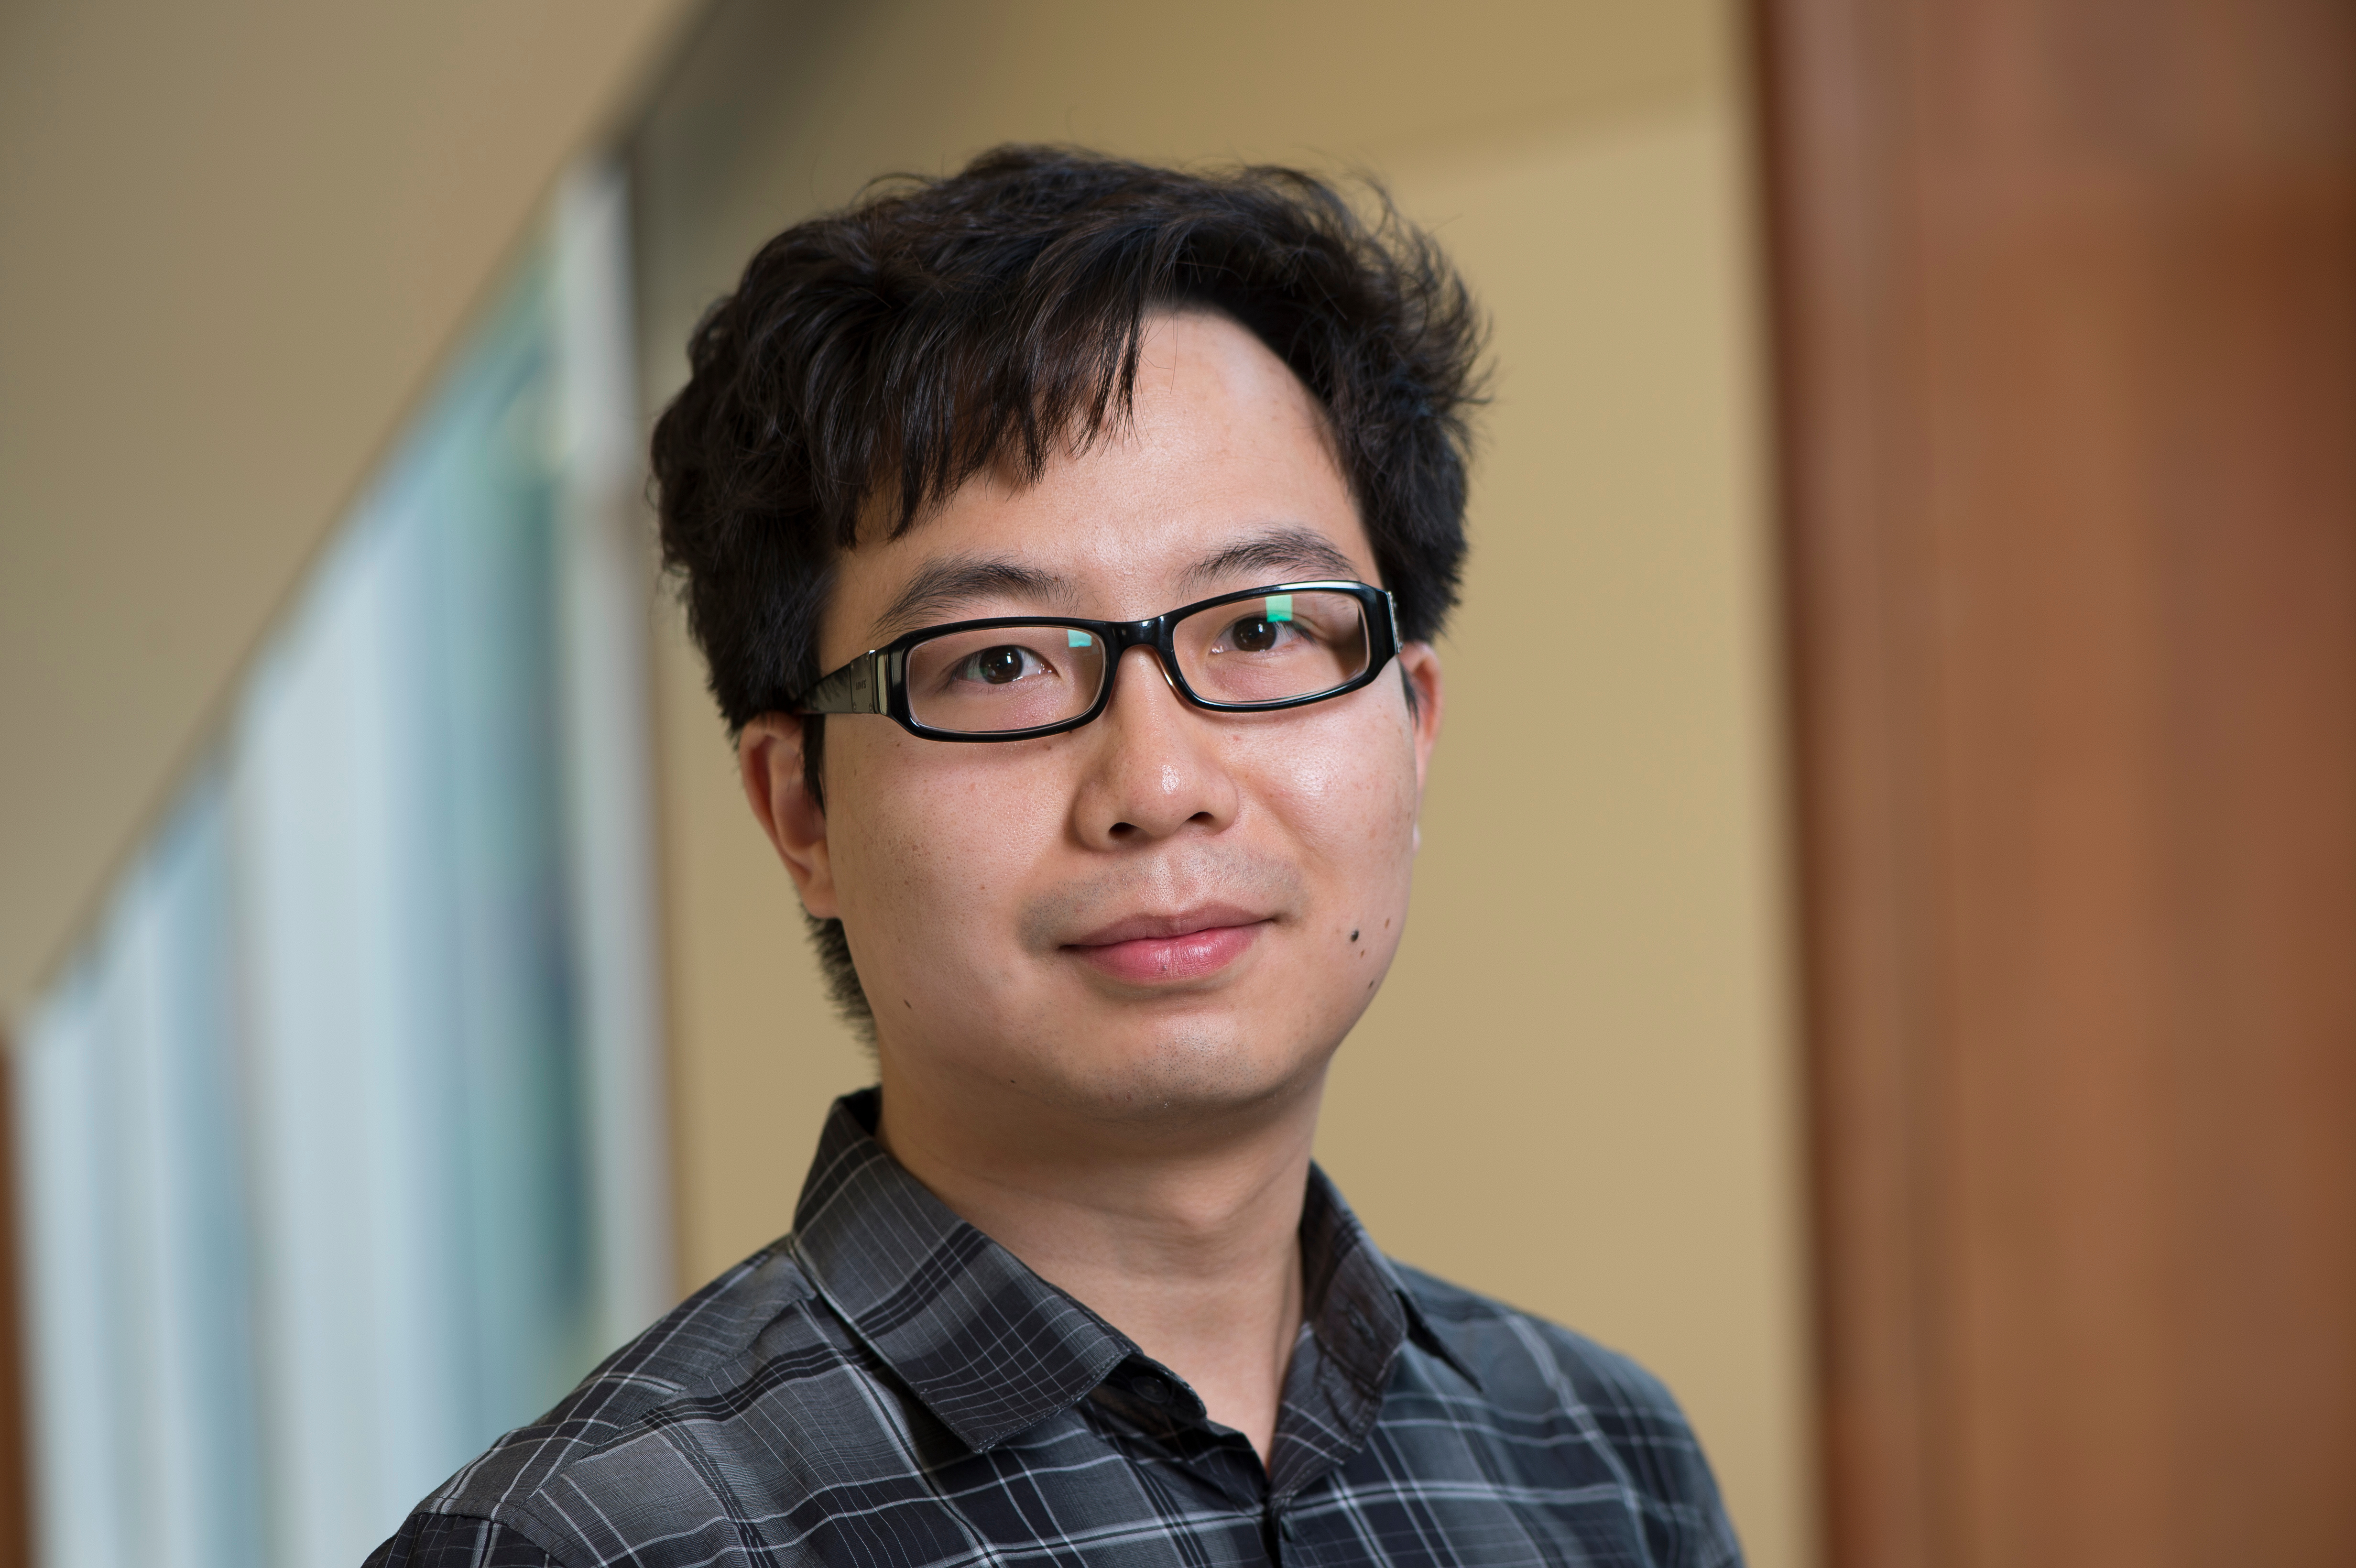 Quanlei Li (李全磊), MPH, MSN, BSN, RN | PhD Student at Johns Hopkins University School of Nursing